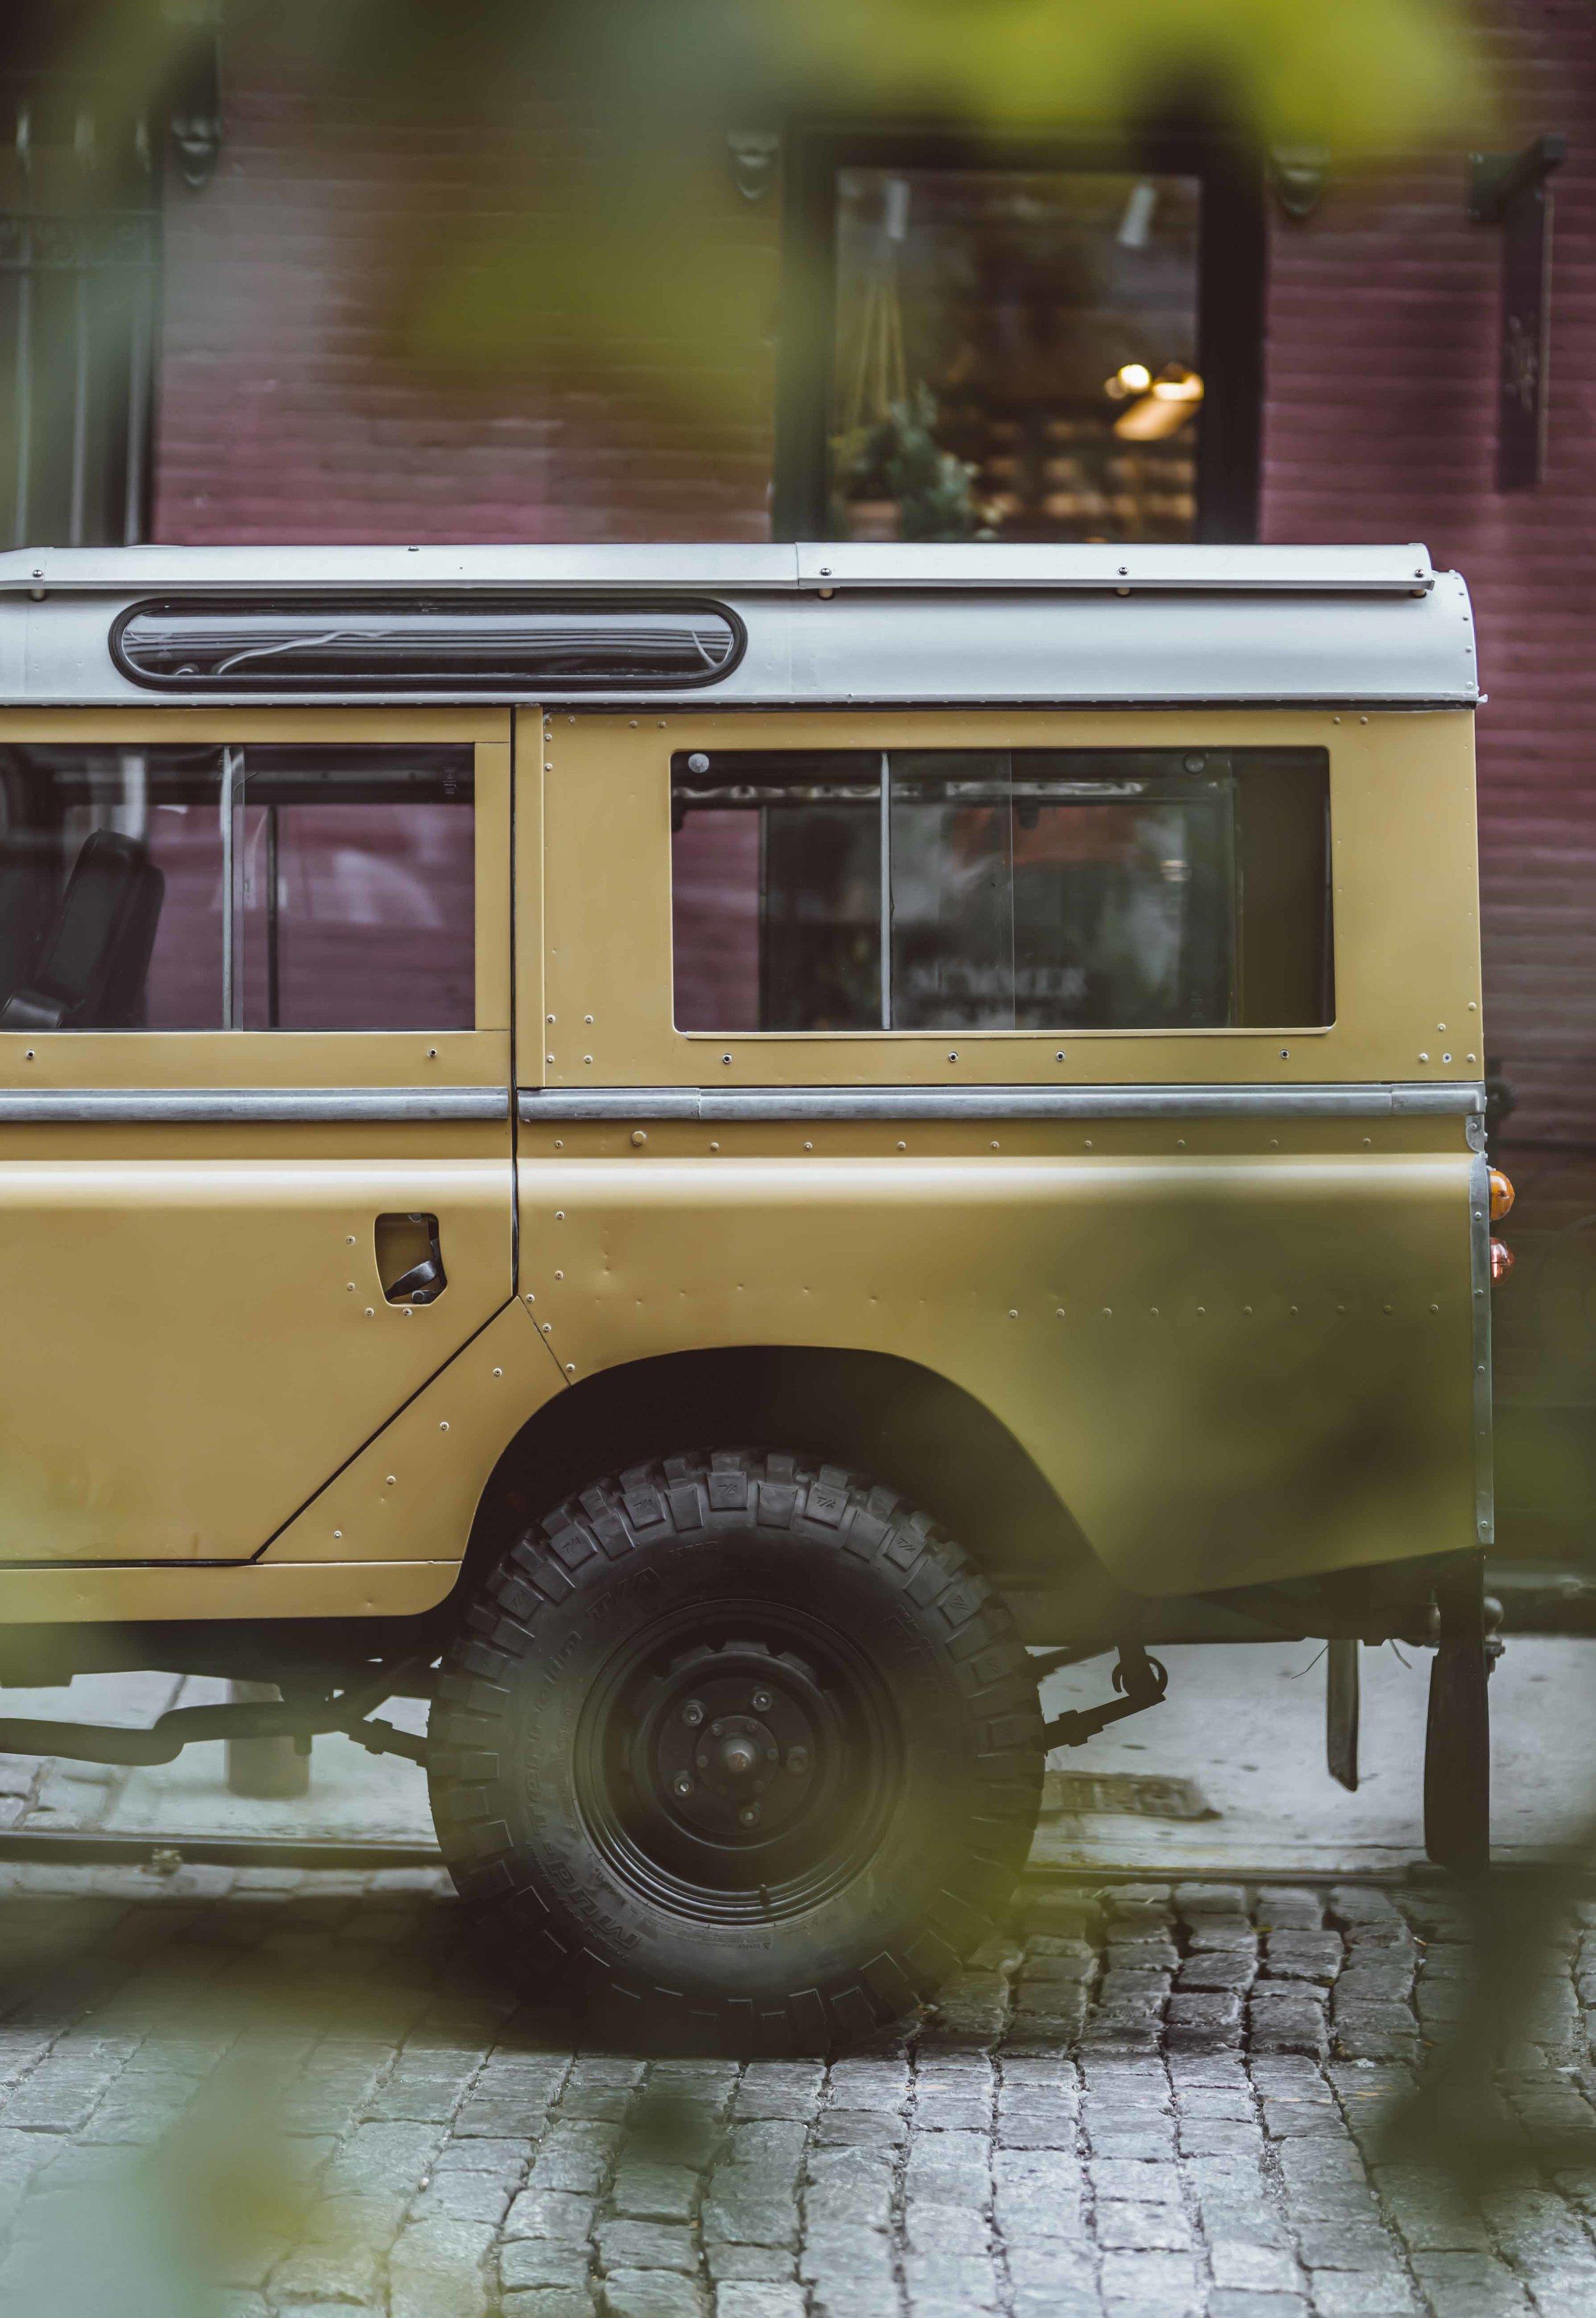 1975_Land_Rover_Series_III_109_Bahama_Gold_2XLarge_0005_Layer 17.jpg